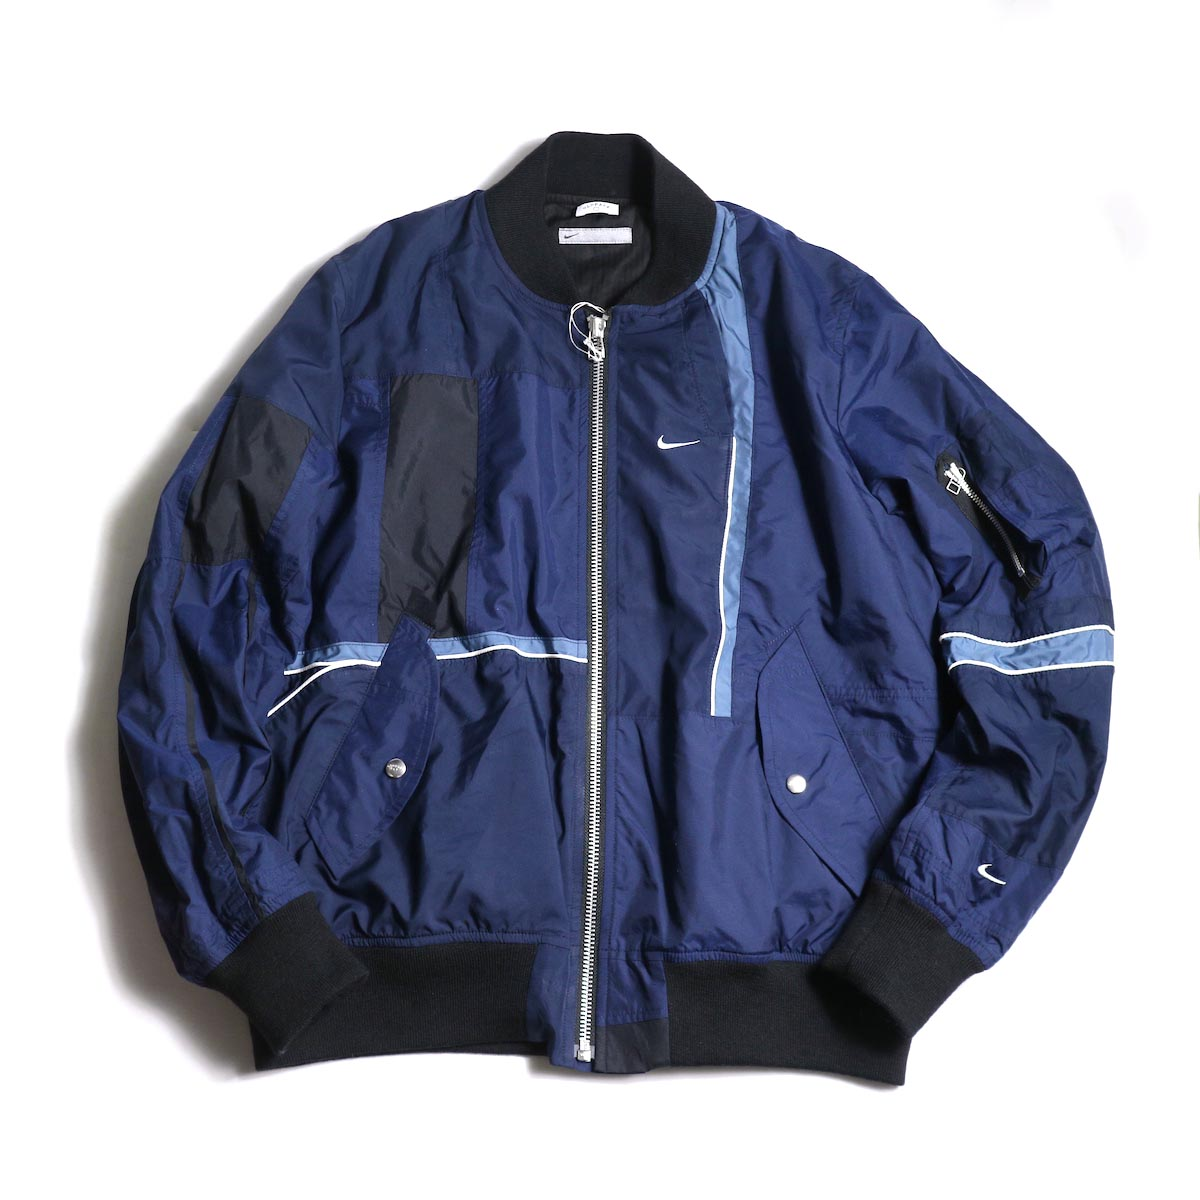 OLD PARK / Flight Jacket Sports -Nike (XLsize)